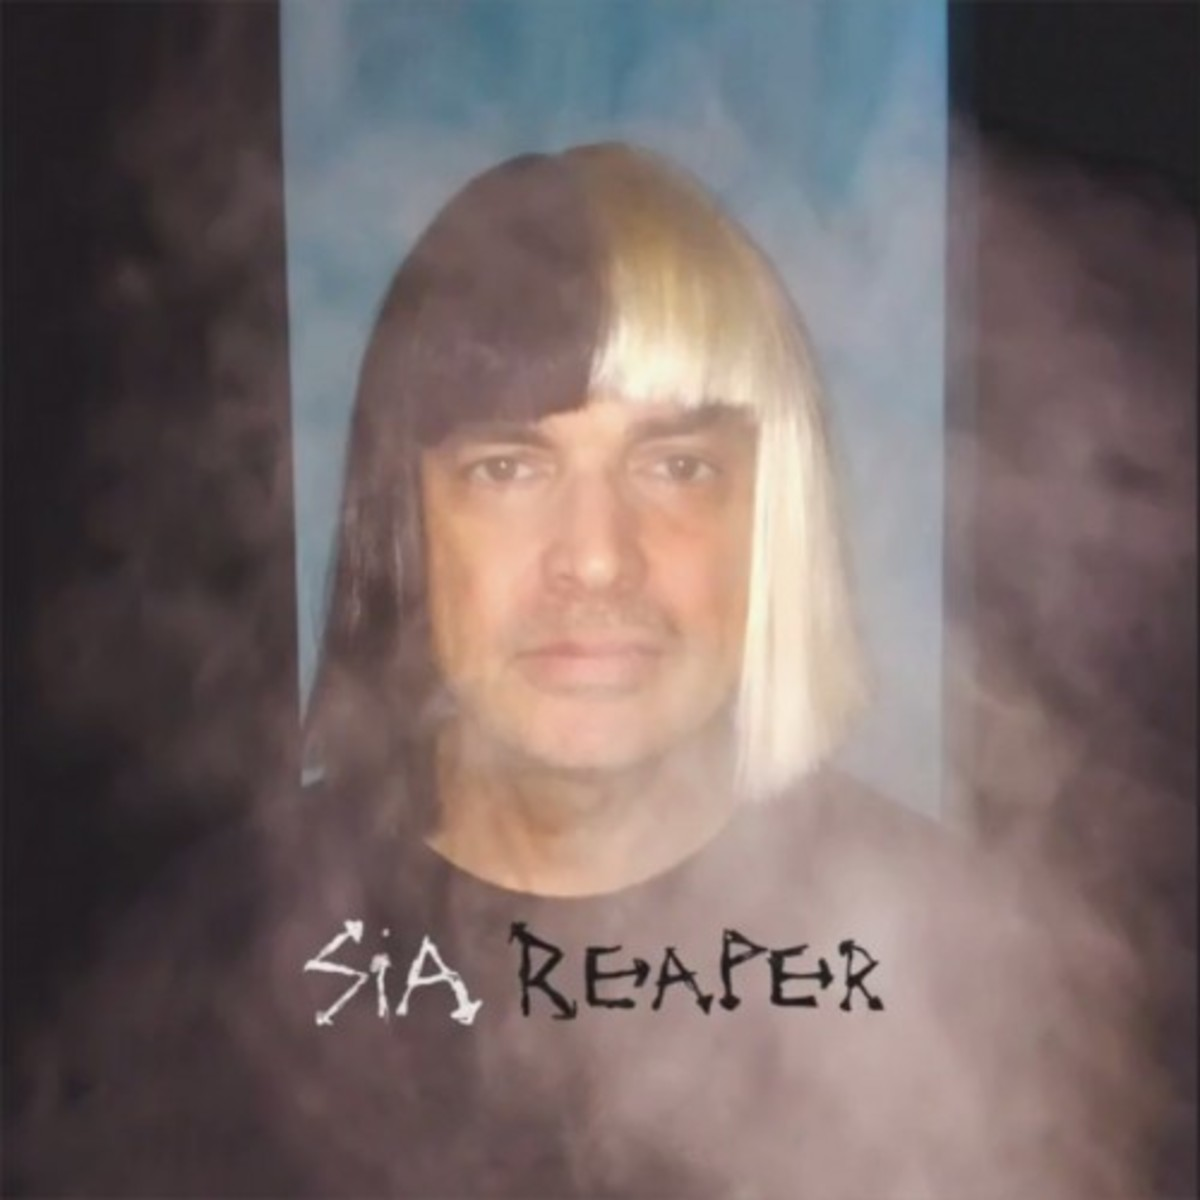 sia-reaper.jpg